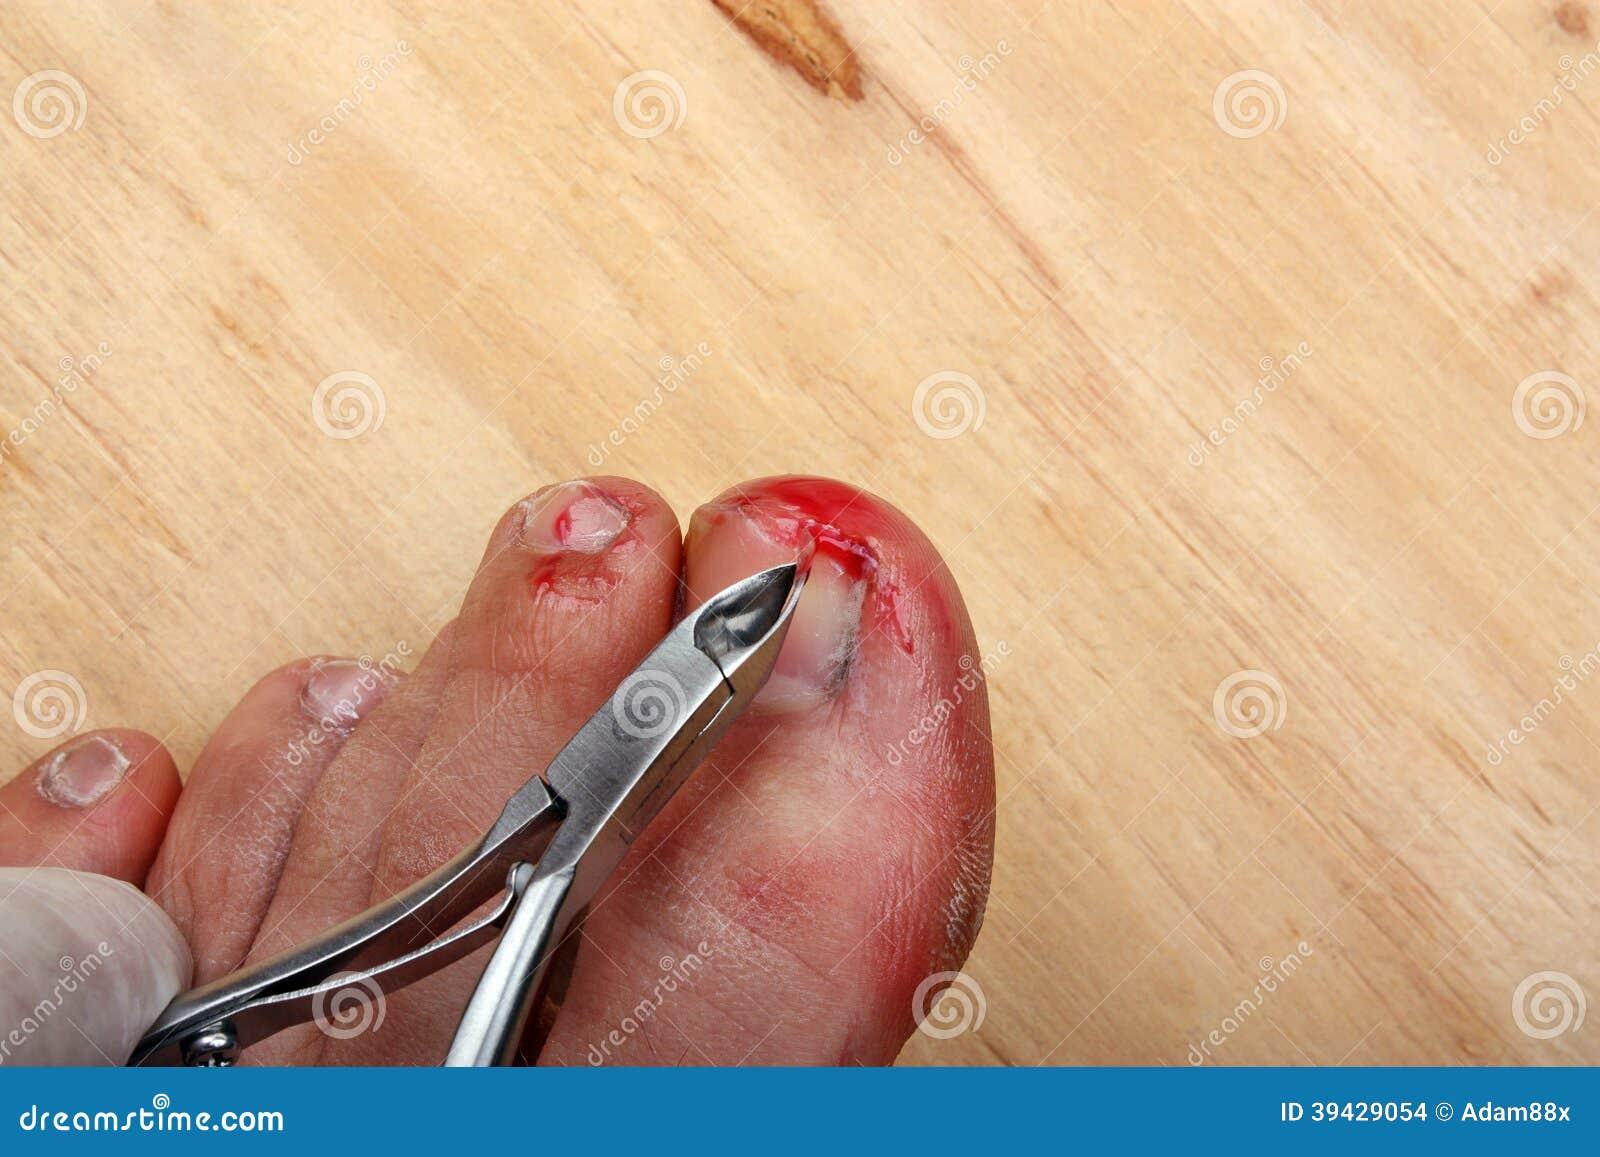 how to set a broken toe